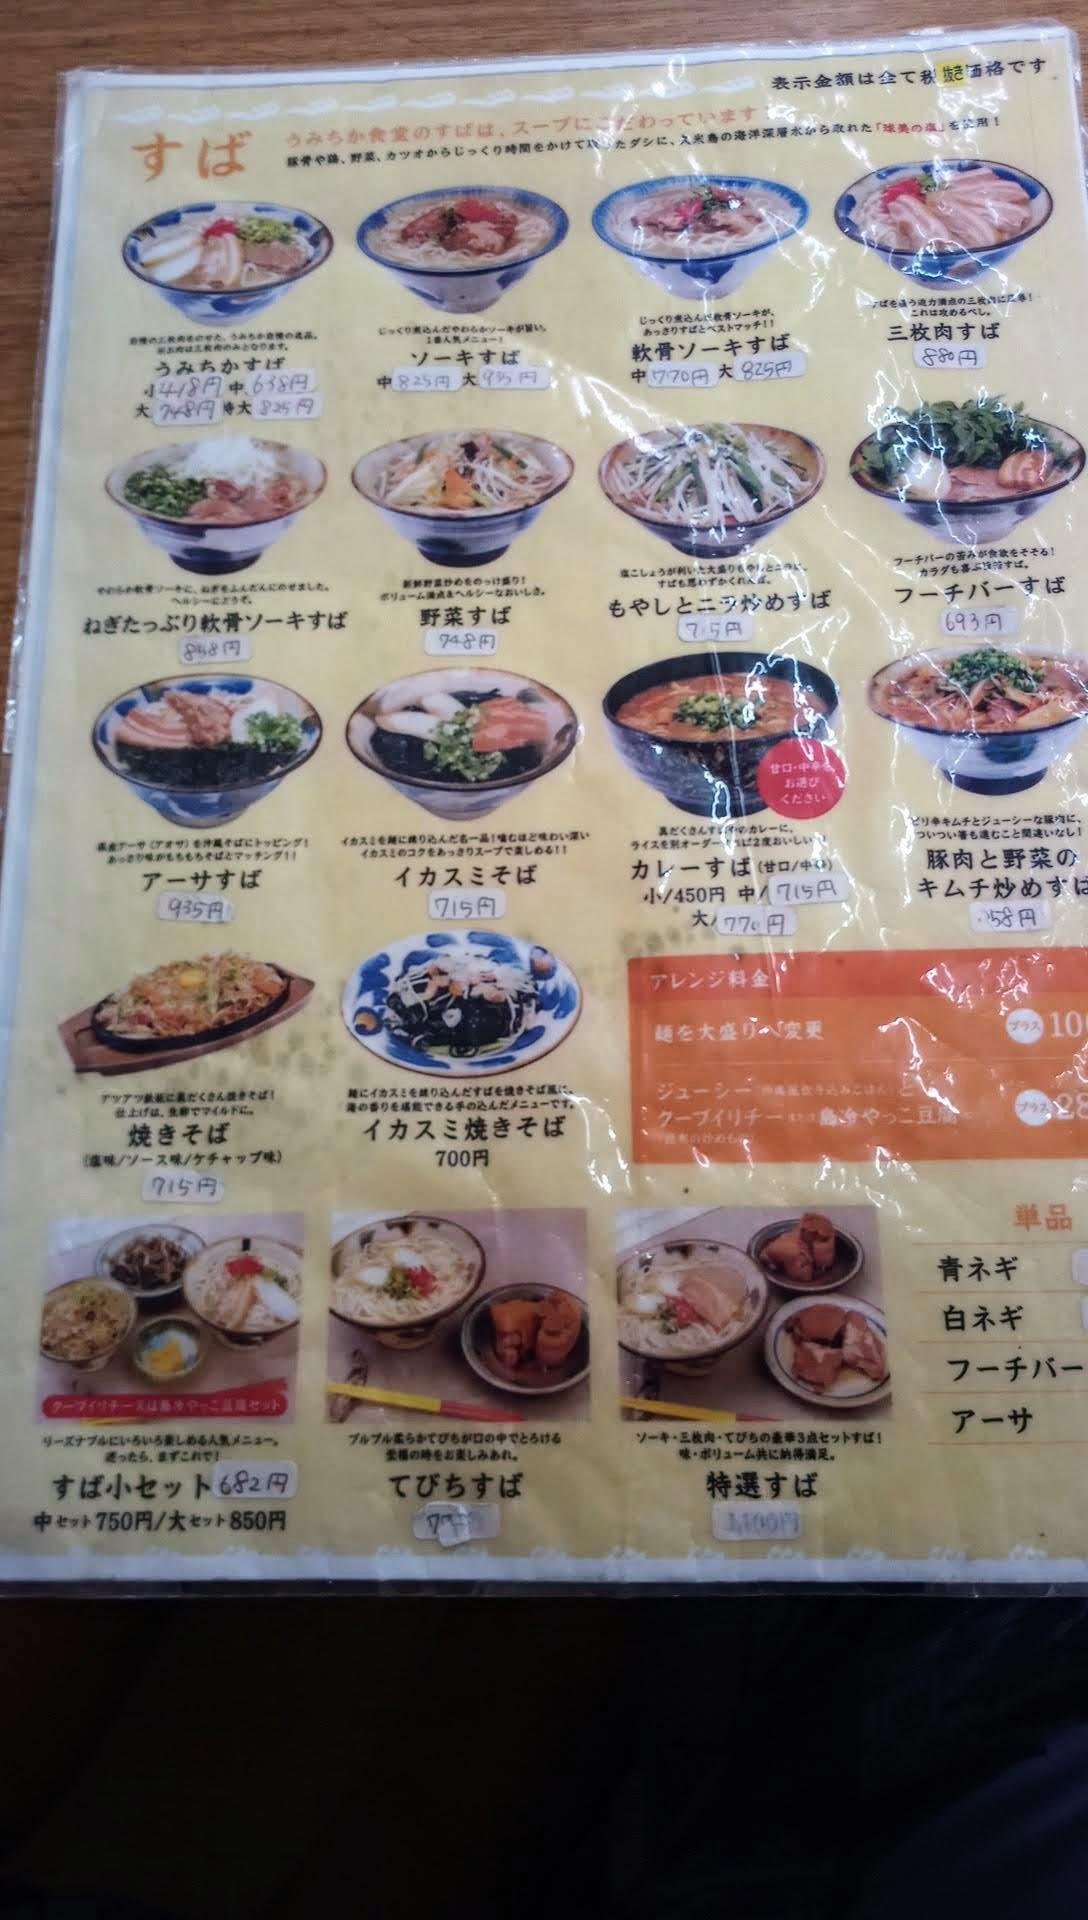 the menu of Umichika Shokudo 1